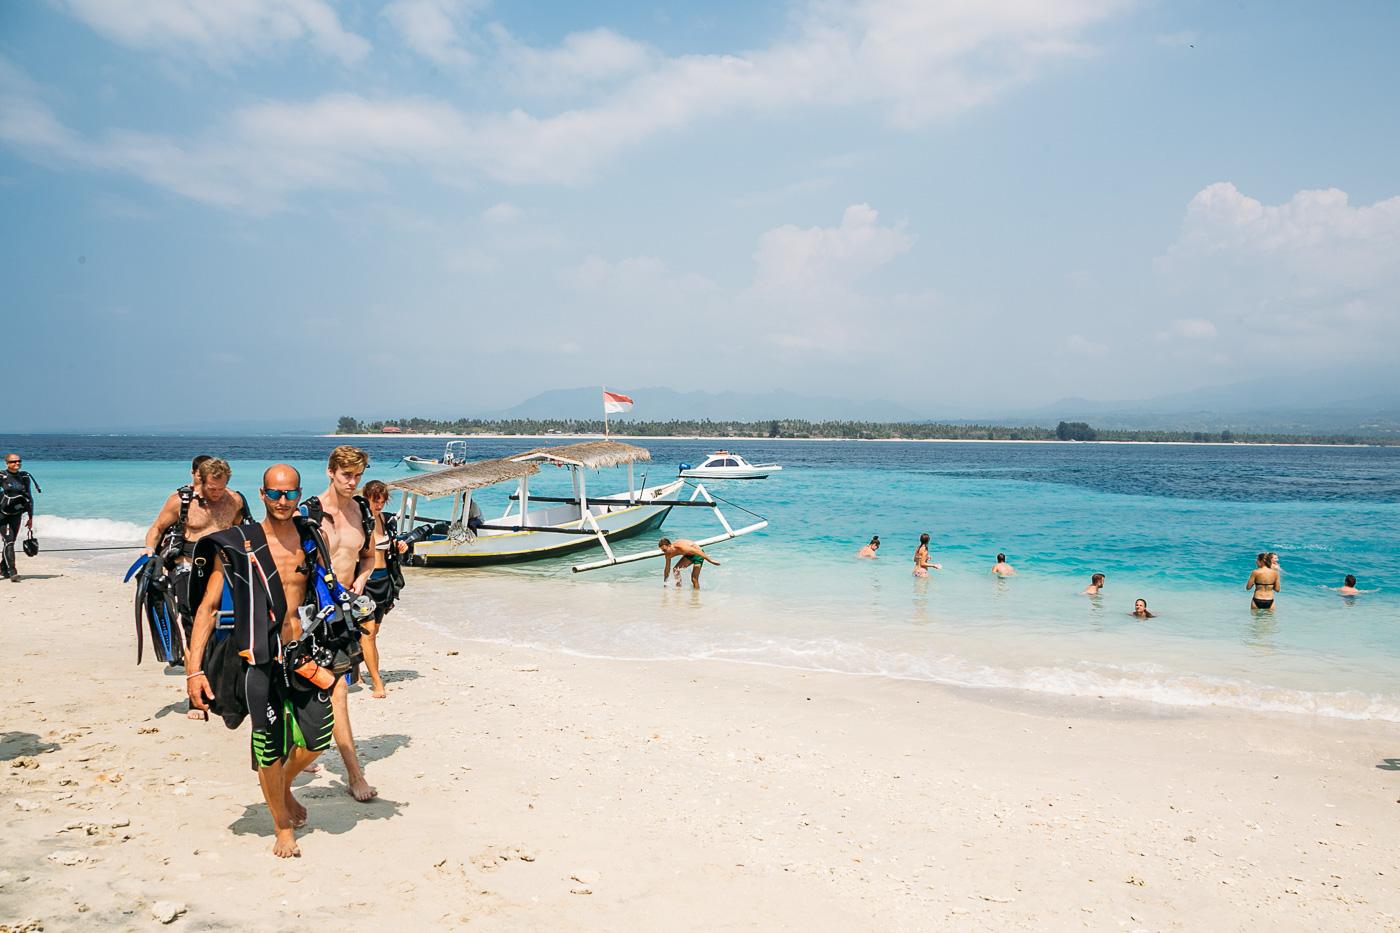 gili-air-island-bali-indonesia-52